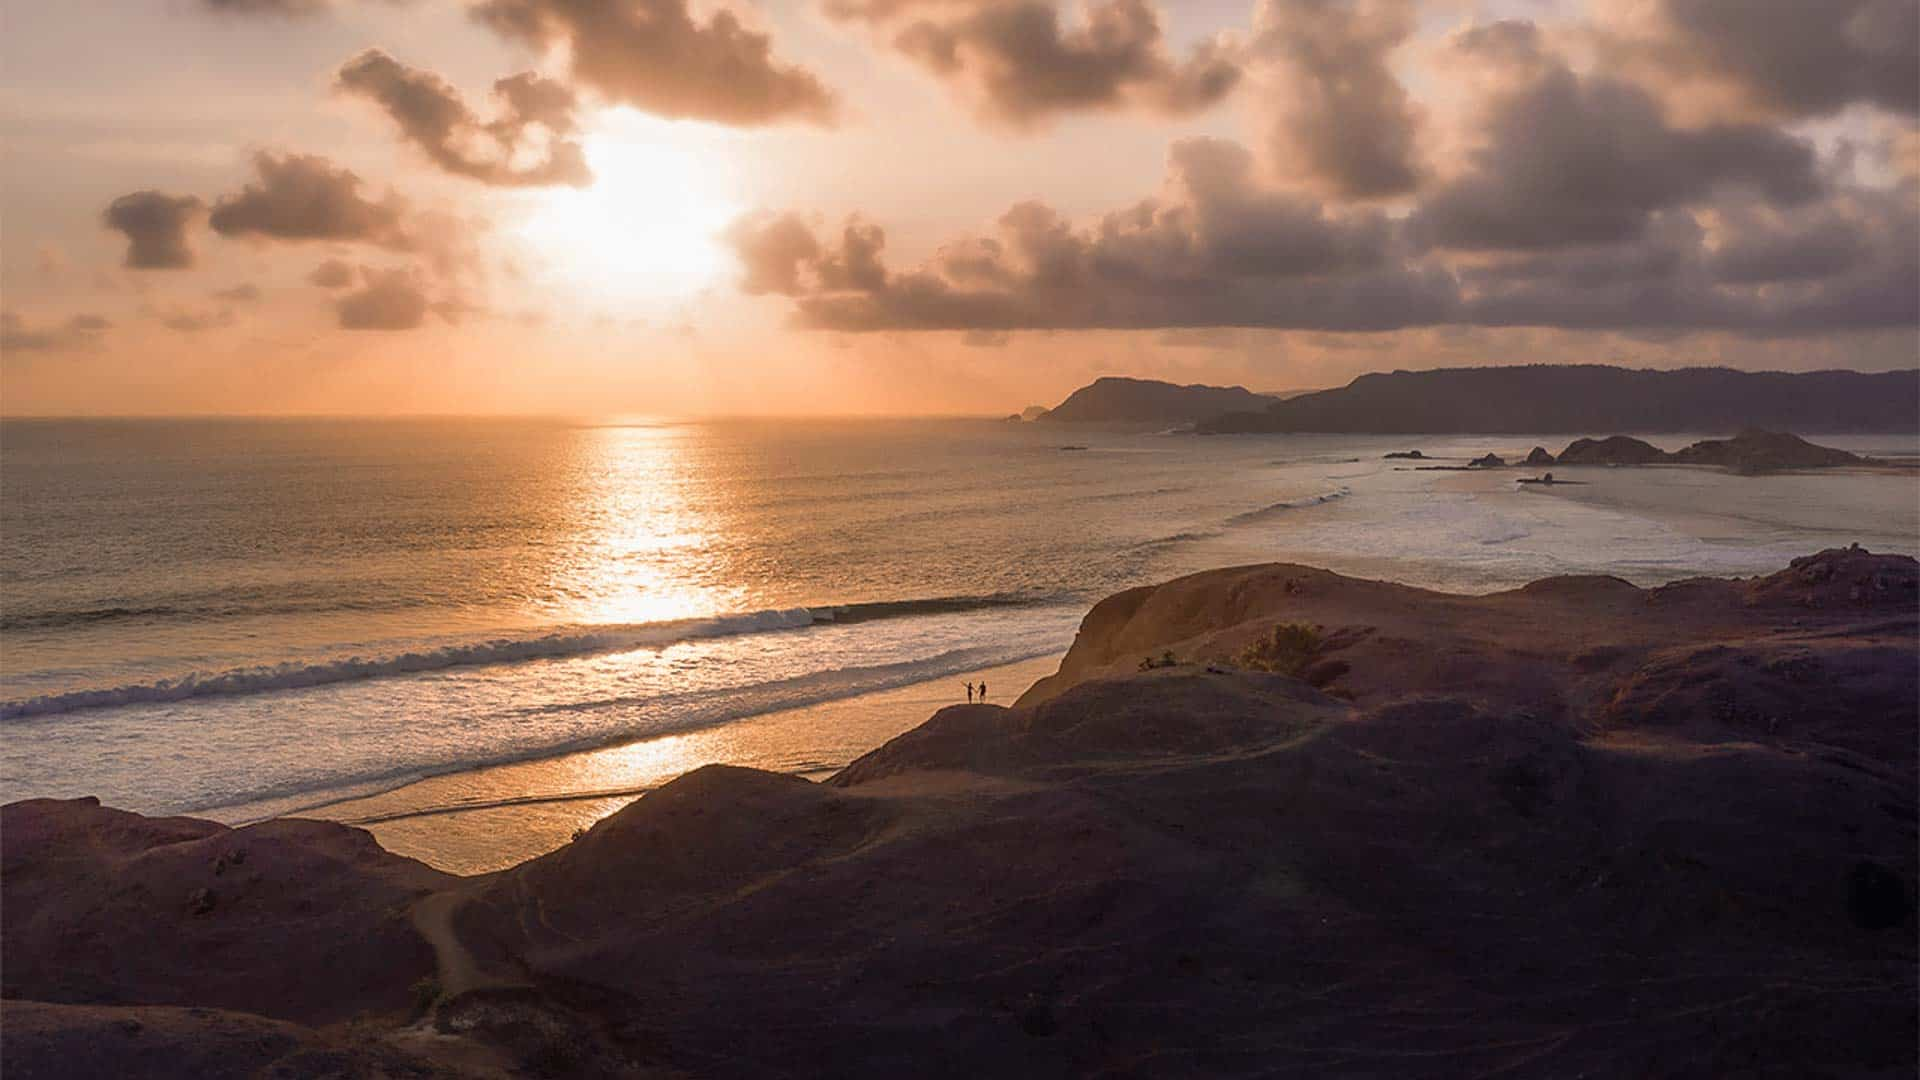 bukit-merese-lombok-sunset